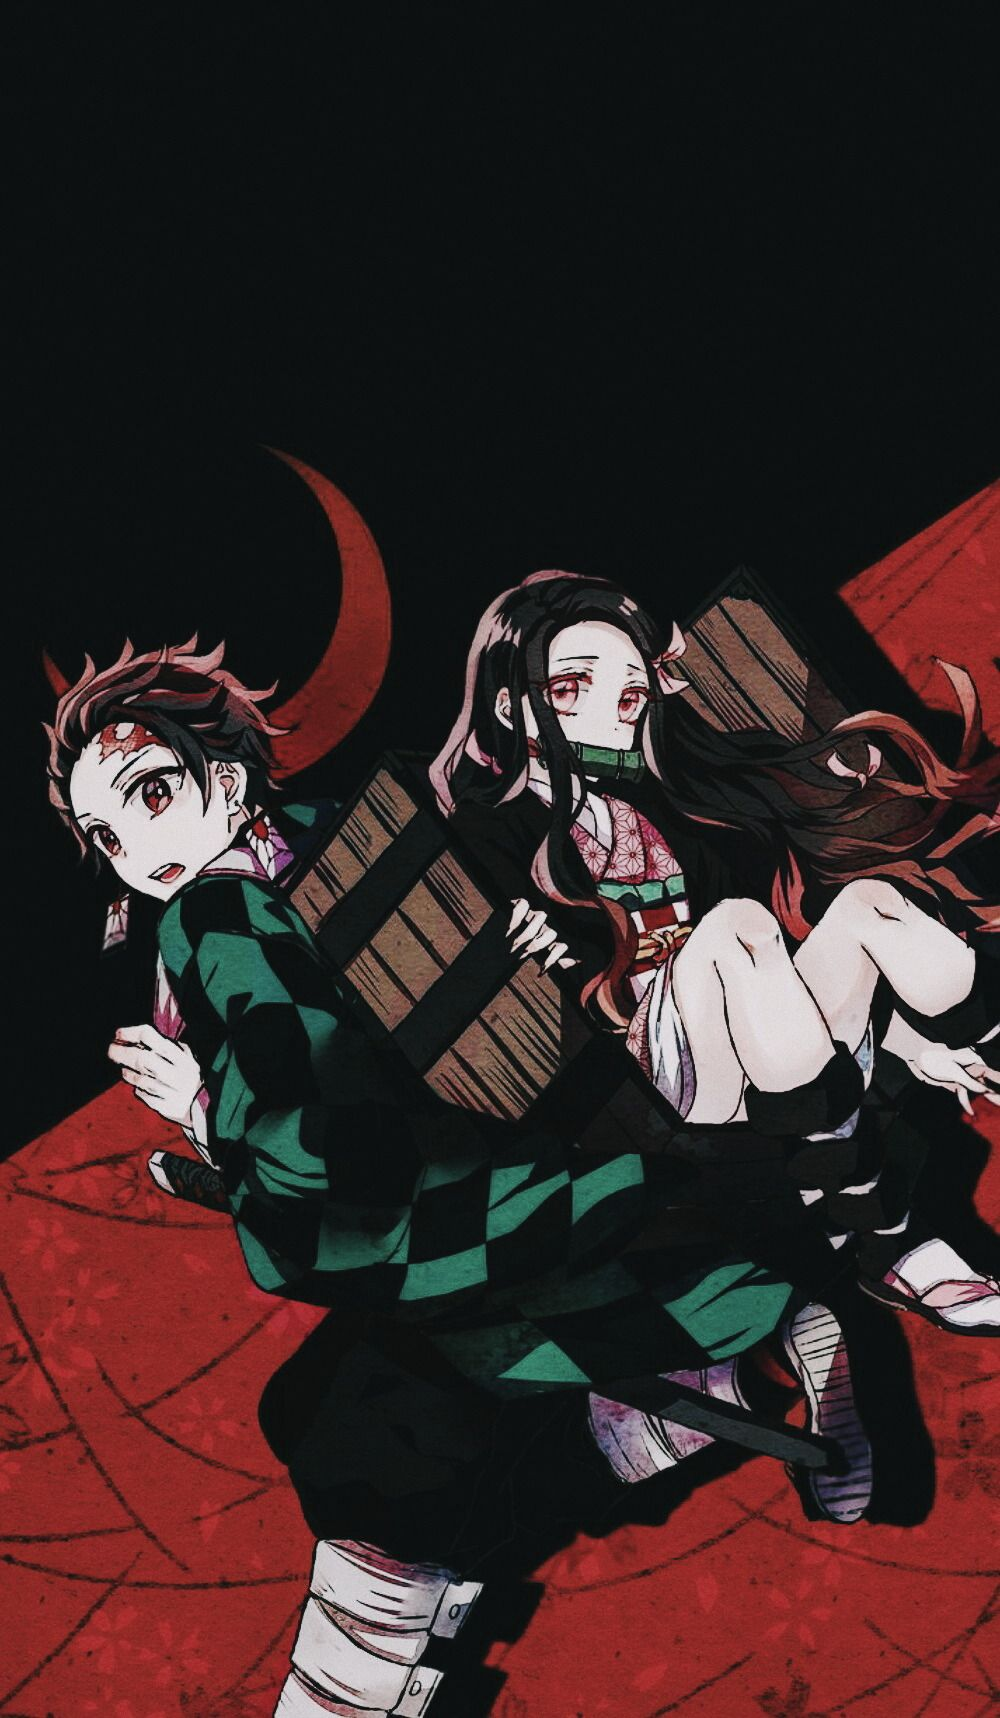 34 Likes Tumblr Slayer Anime Bleach Anime Ichigo Android Wallpaper Anime